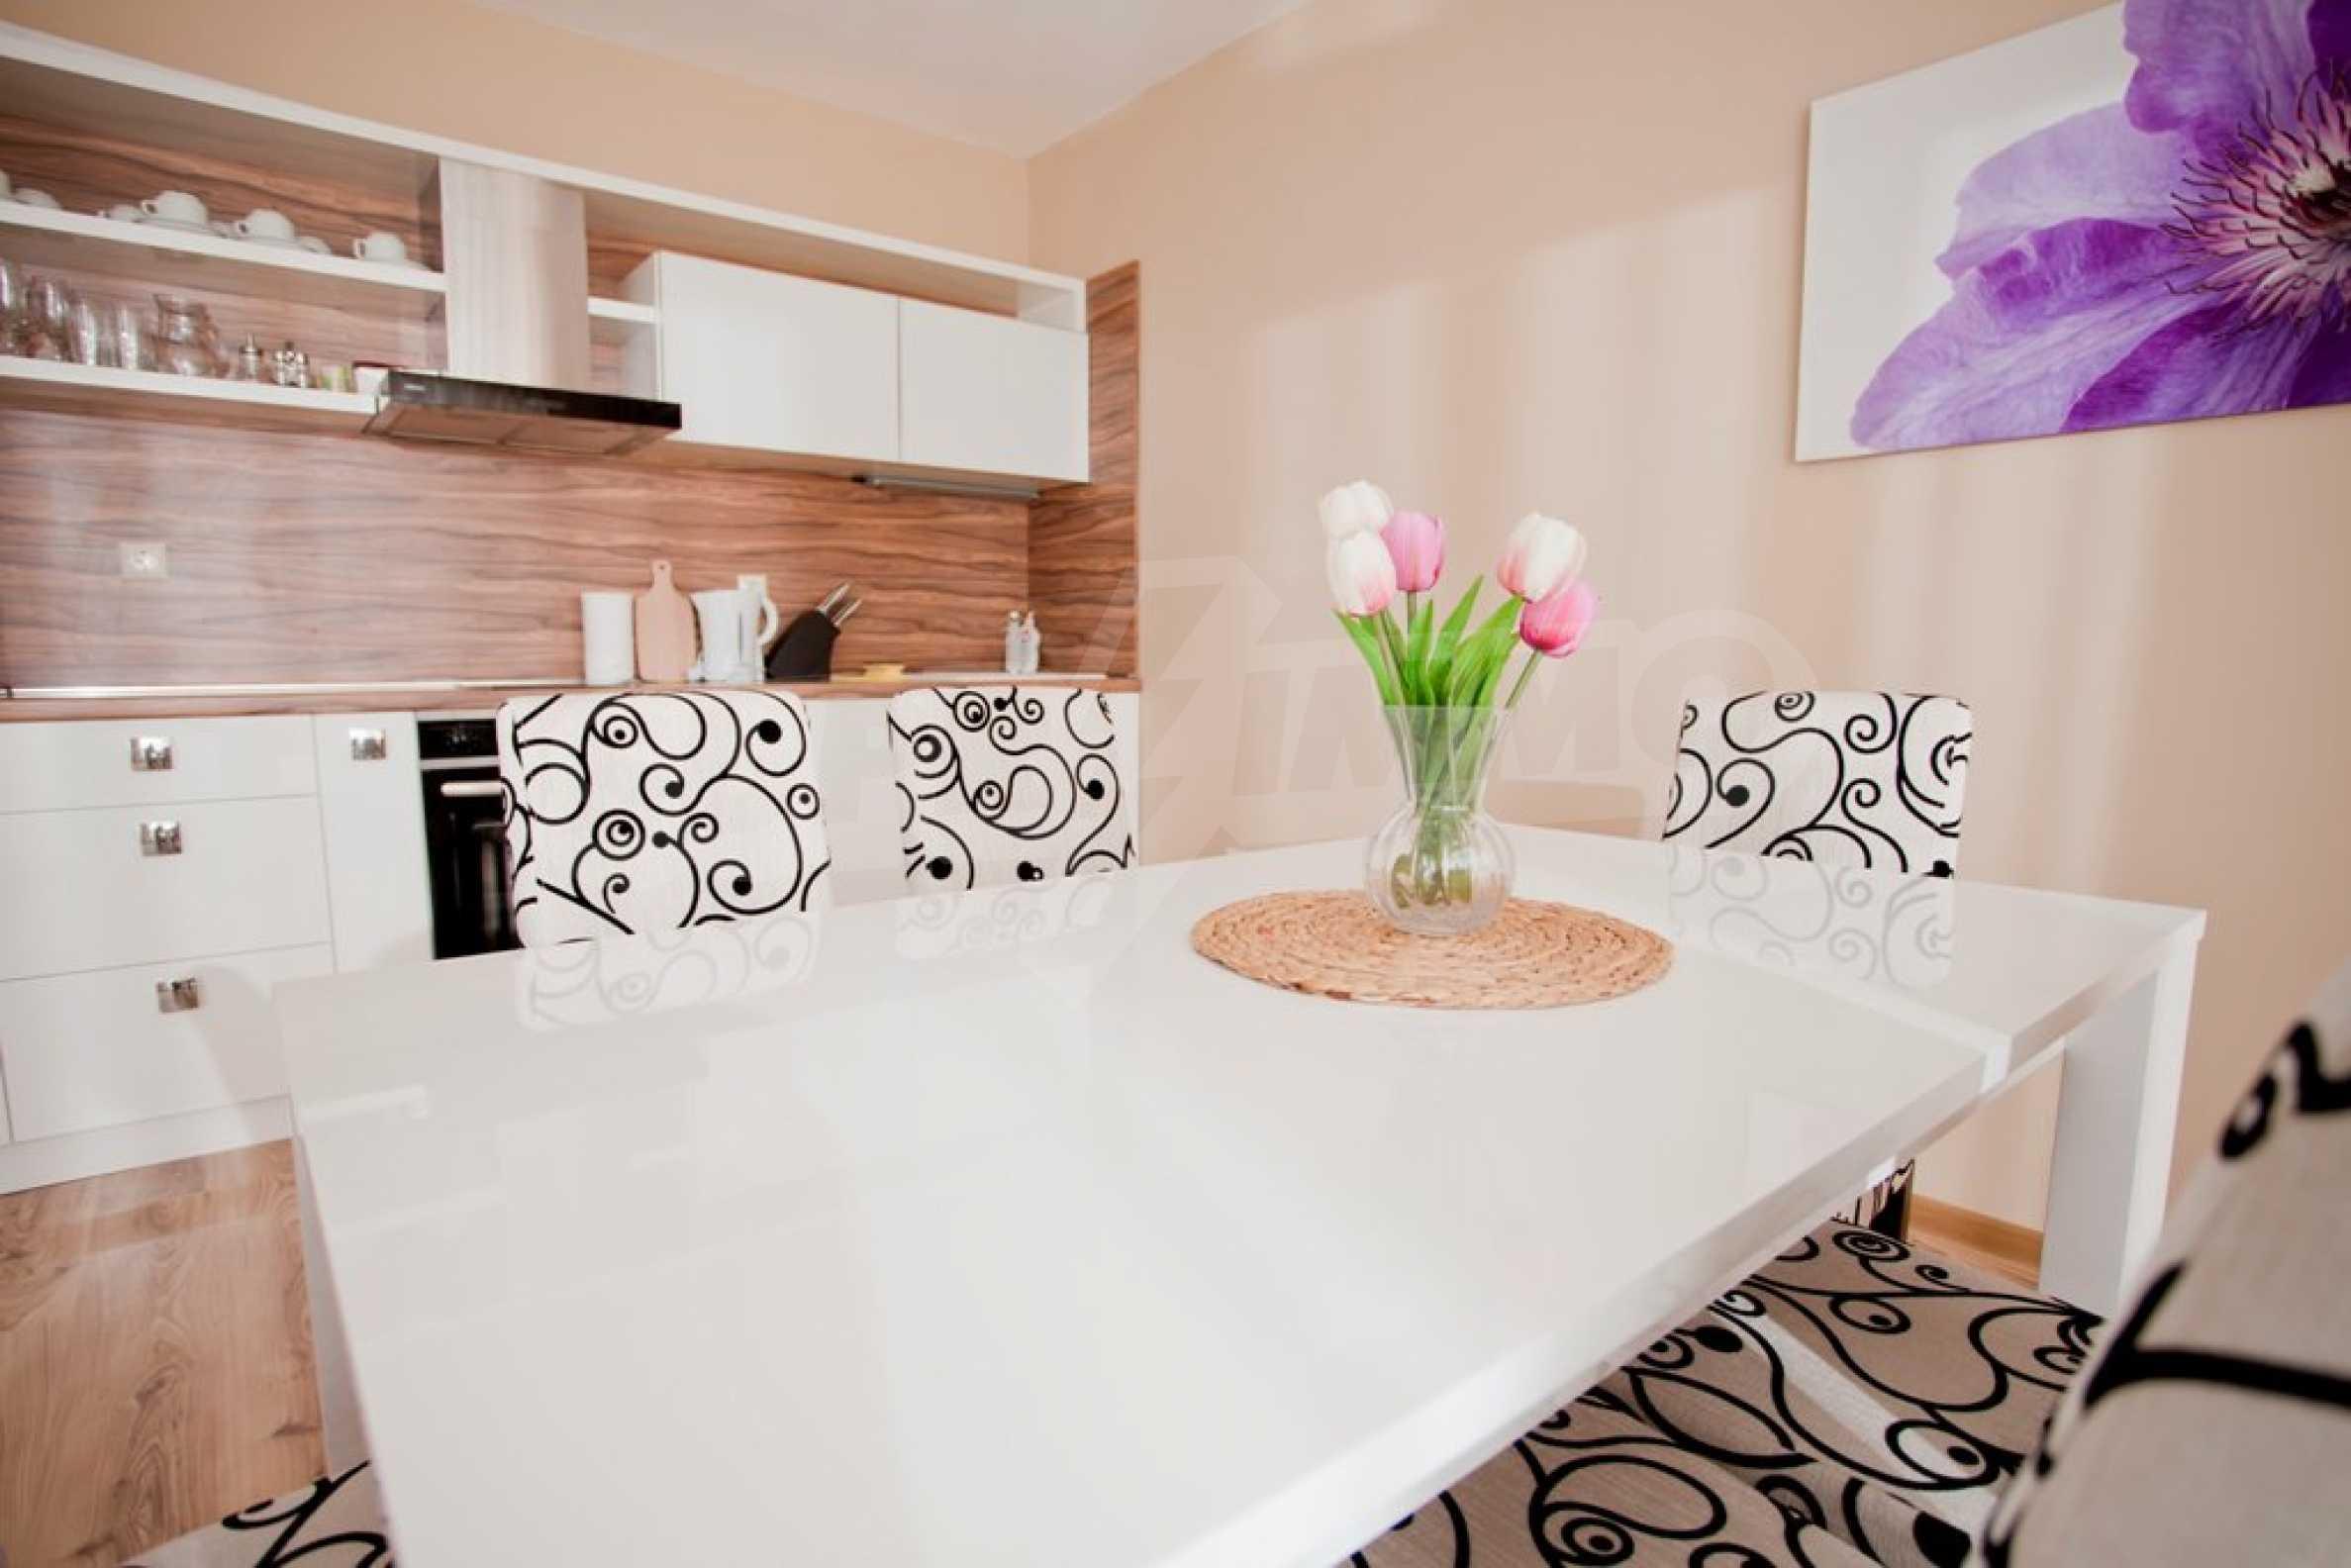 New apartment complex Atia resort in Chernomorets 20